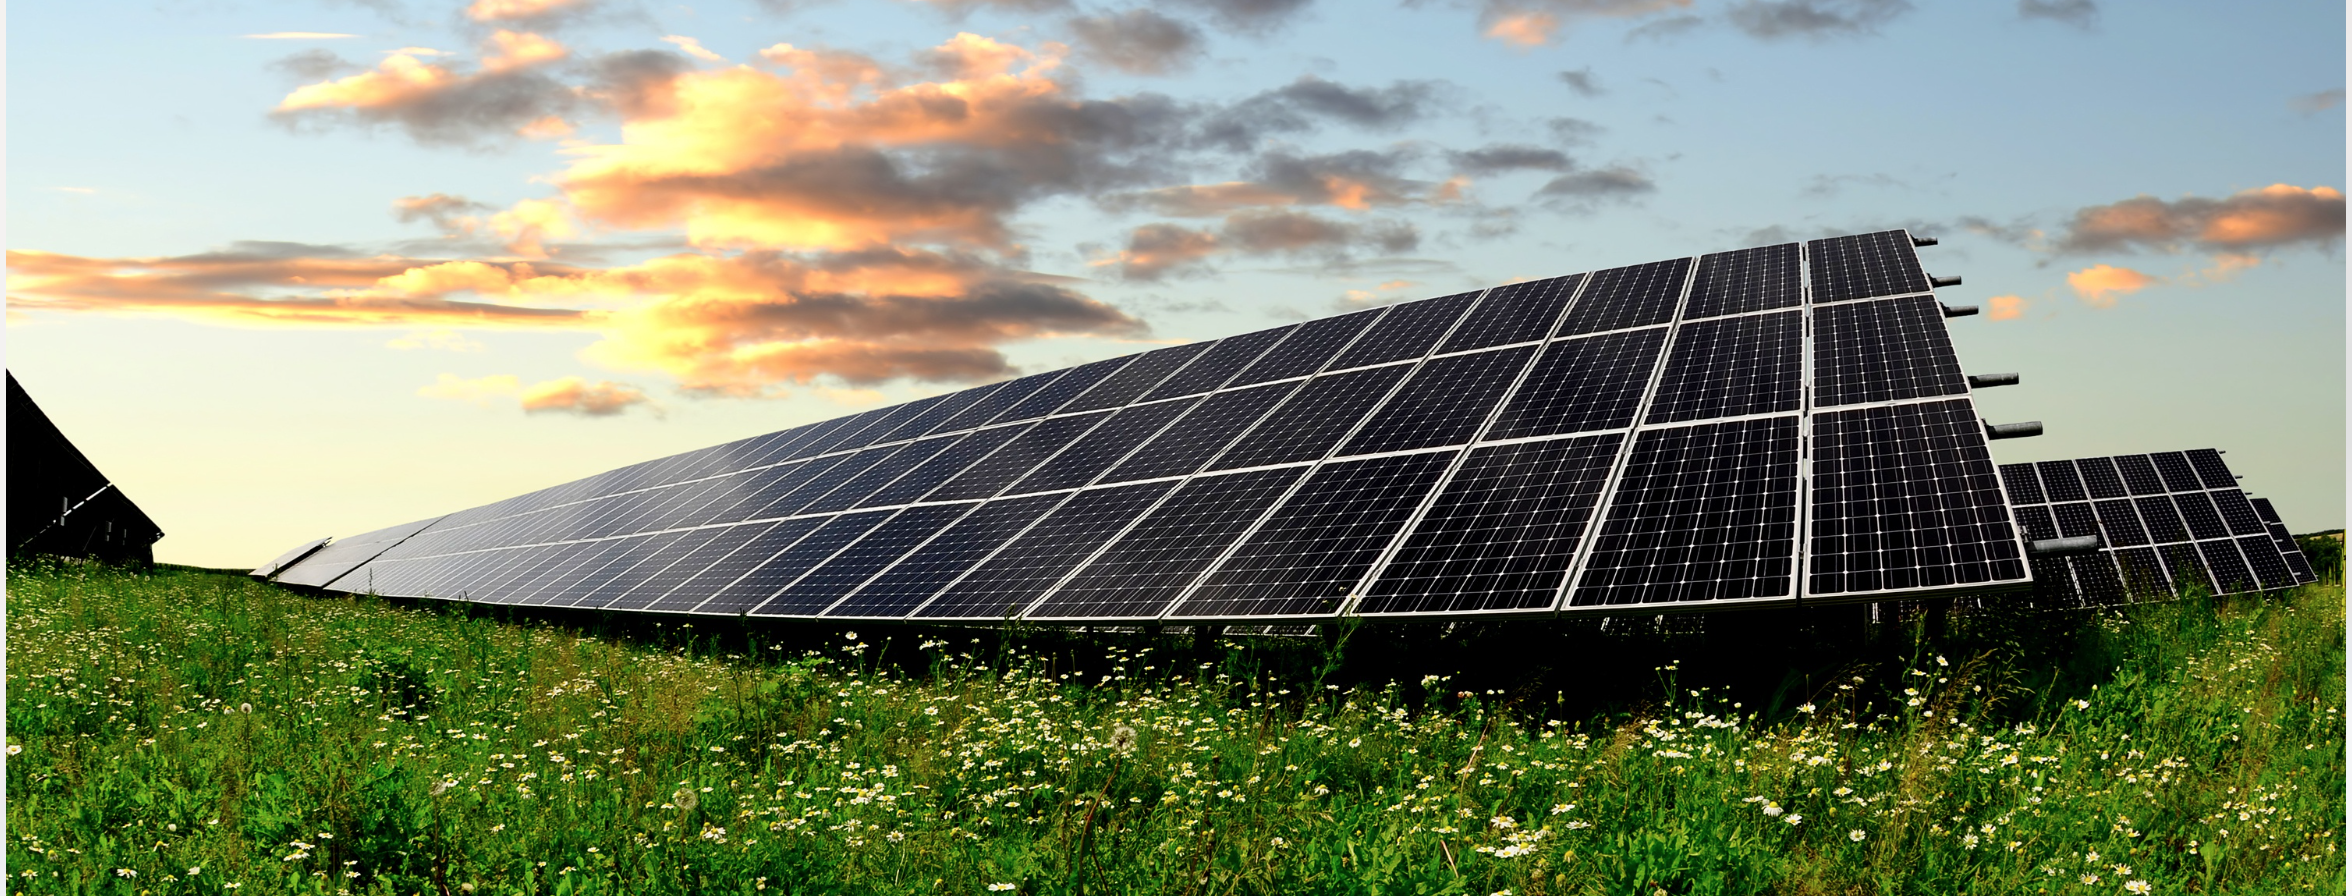 fotovoltanika